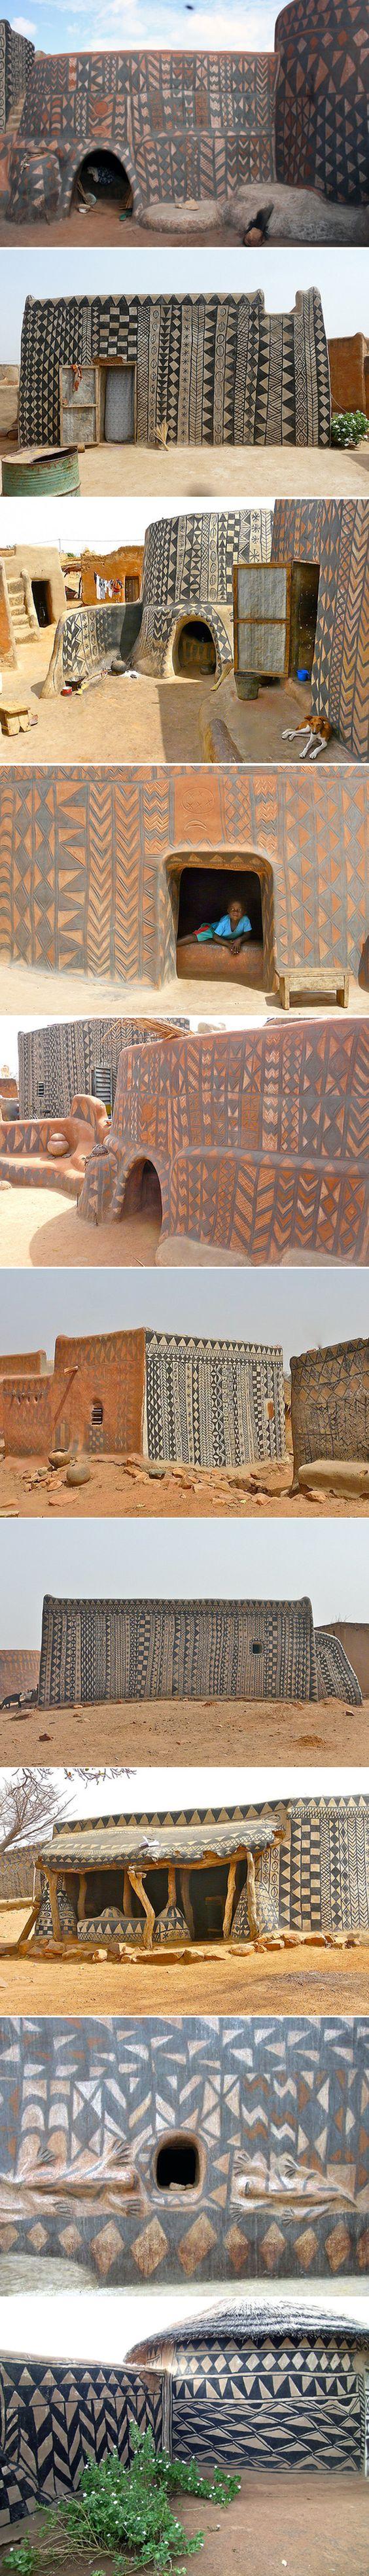 Maisons-au-Burkina-Faso: